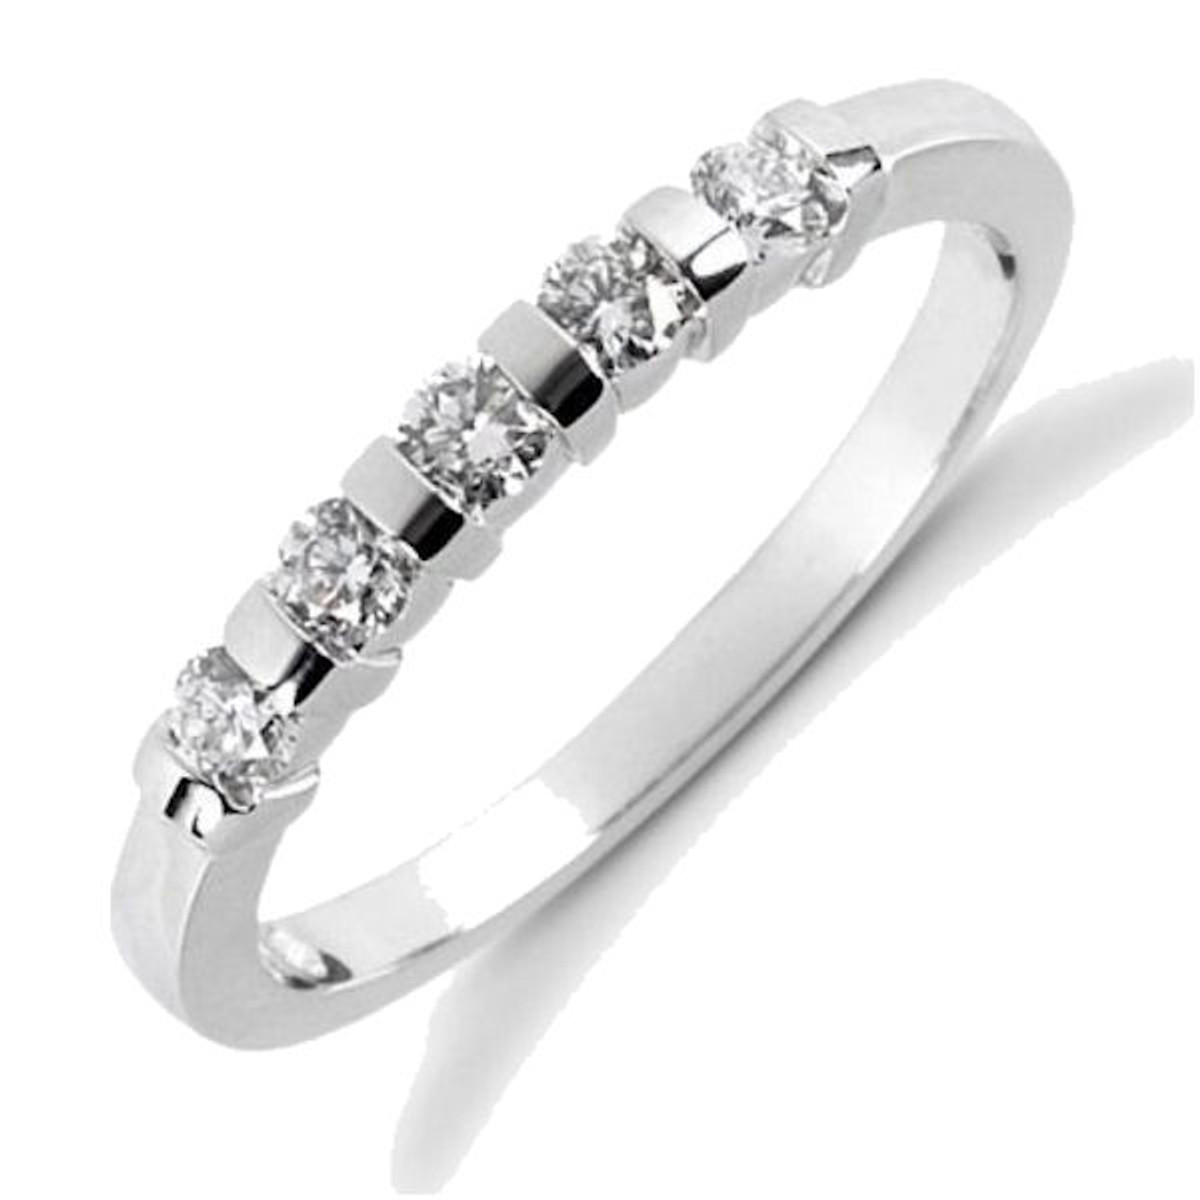 0.25 Ct Tw 5 stone diamond anniversary ring